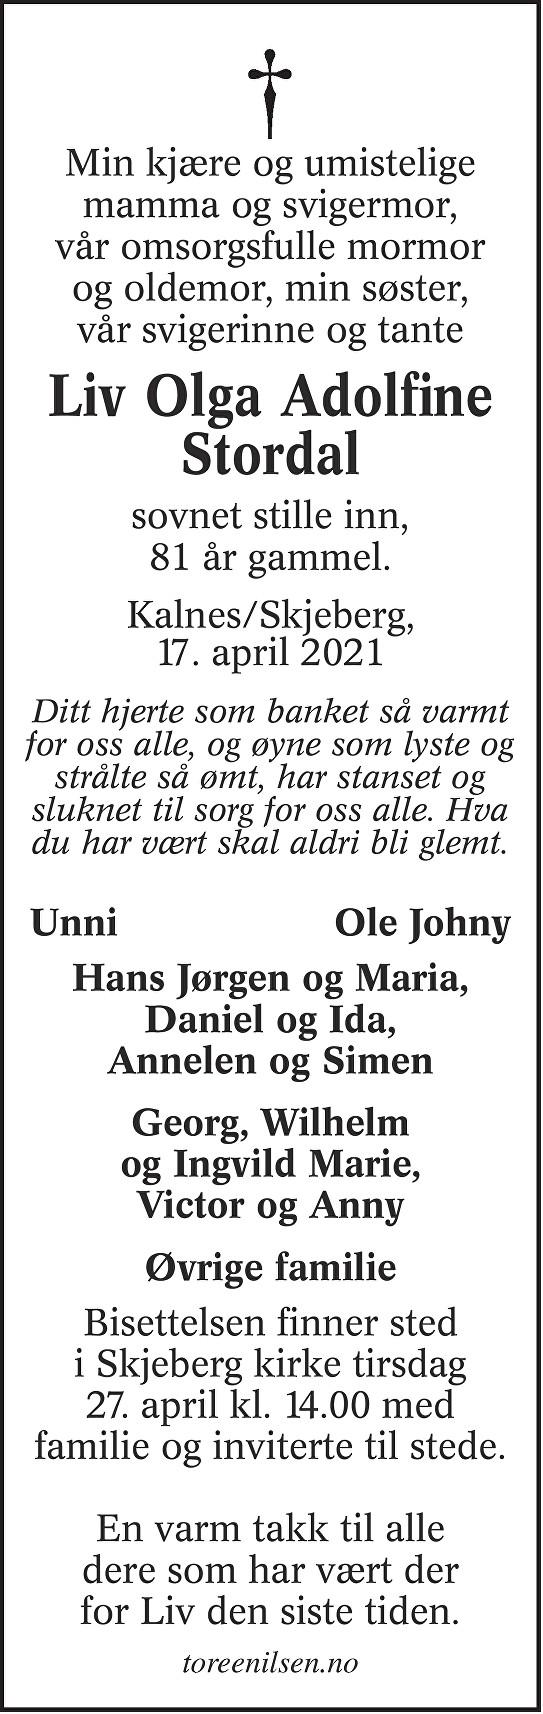 Liv Olga Adolfine Stordal Dødsannonse